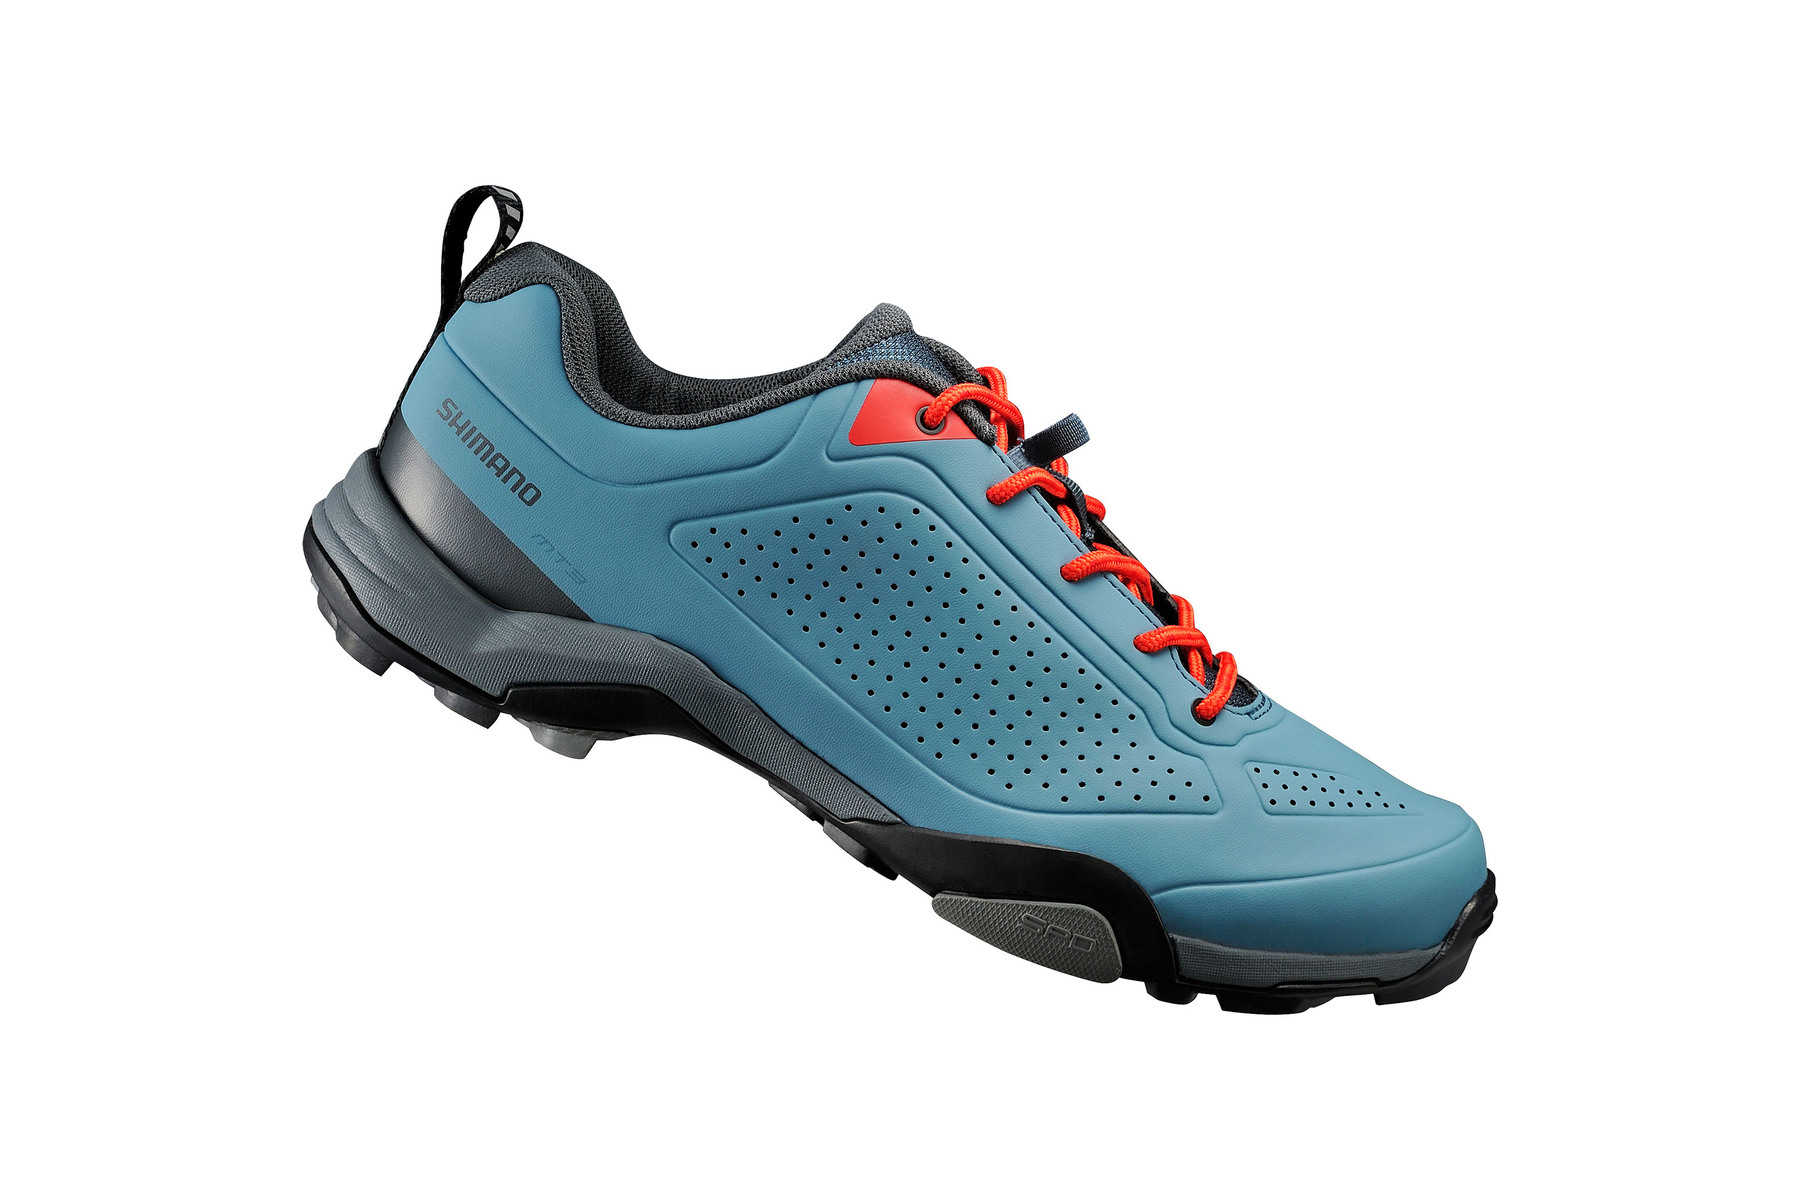 SH-MT3 MTB/trekking shoes